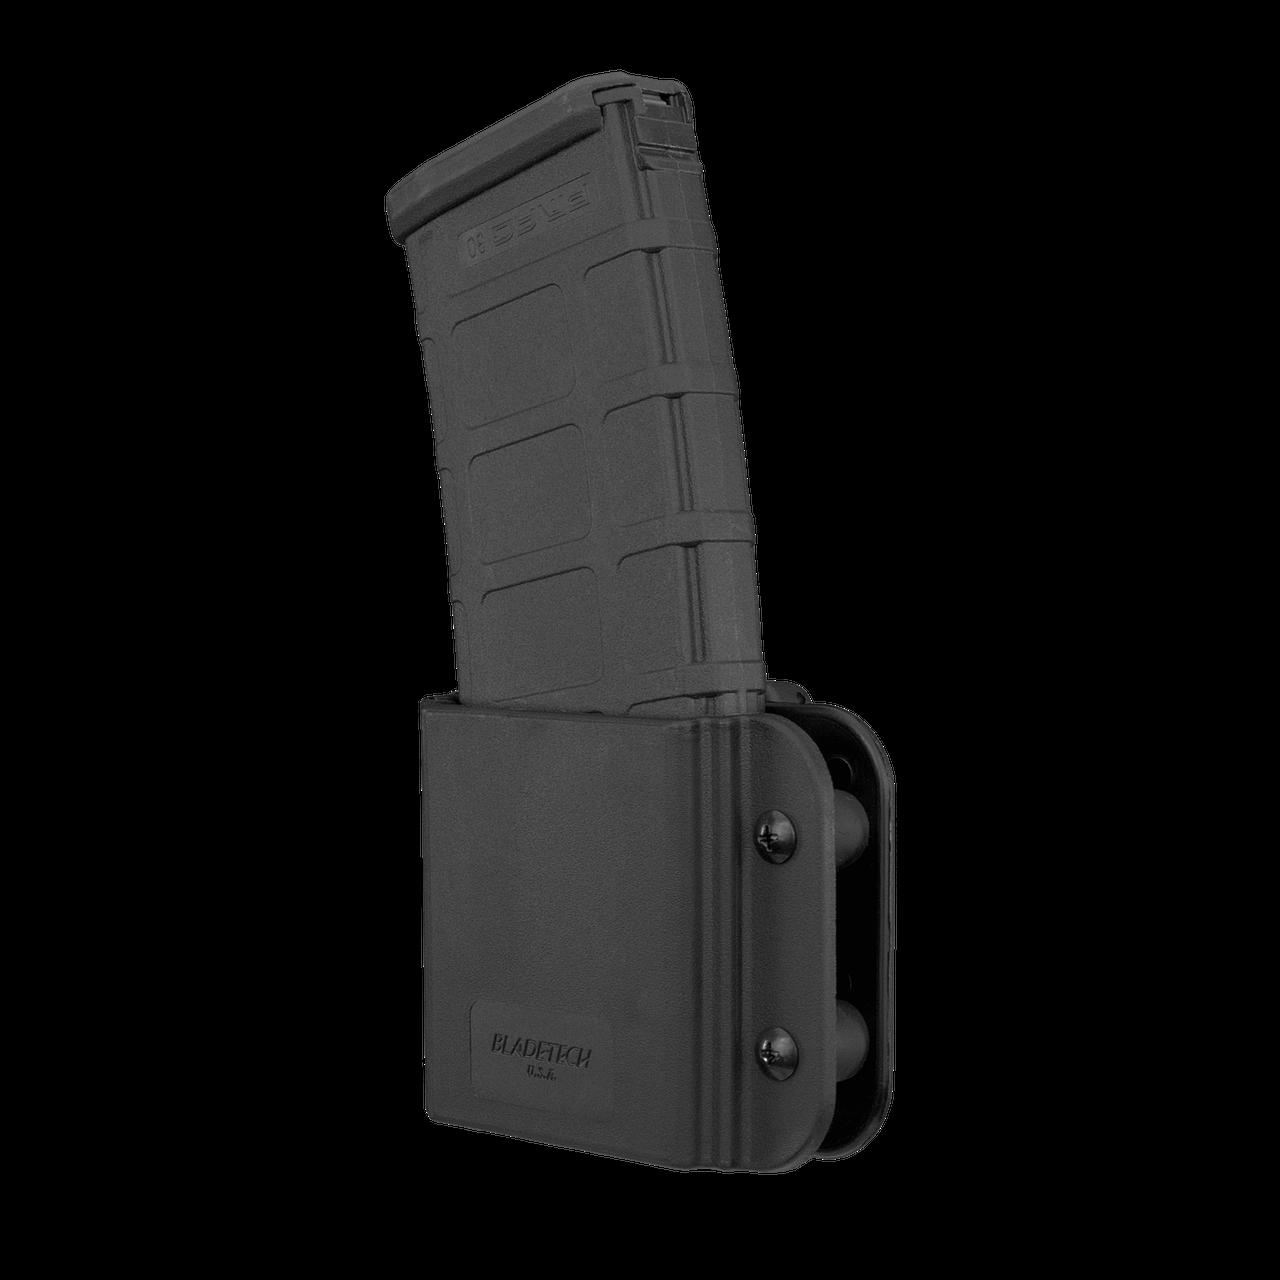 Blade-Tech Signature Series AR-15 Single Mag Pouch